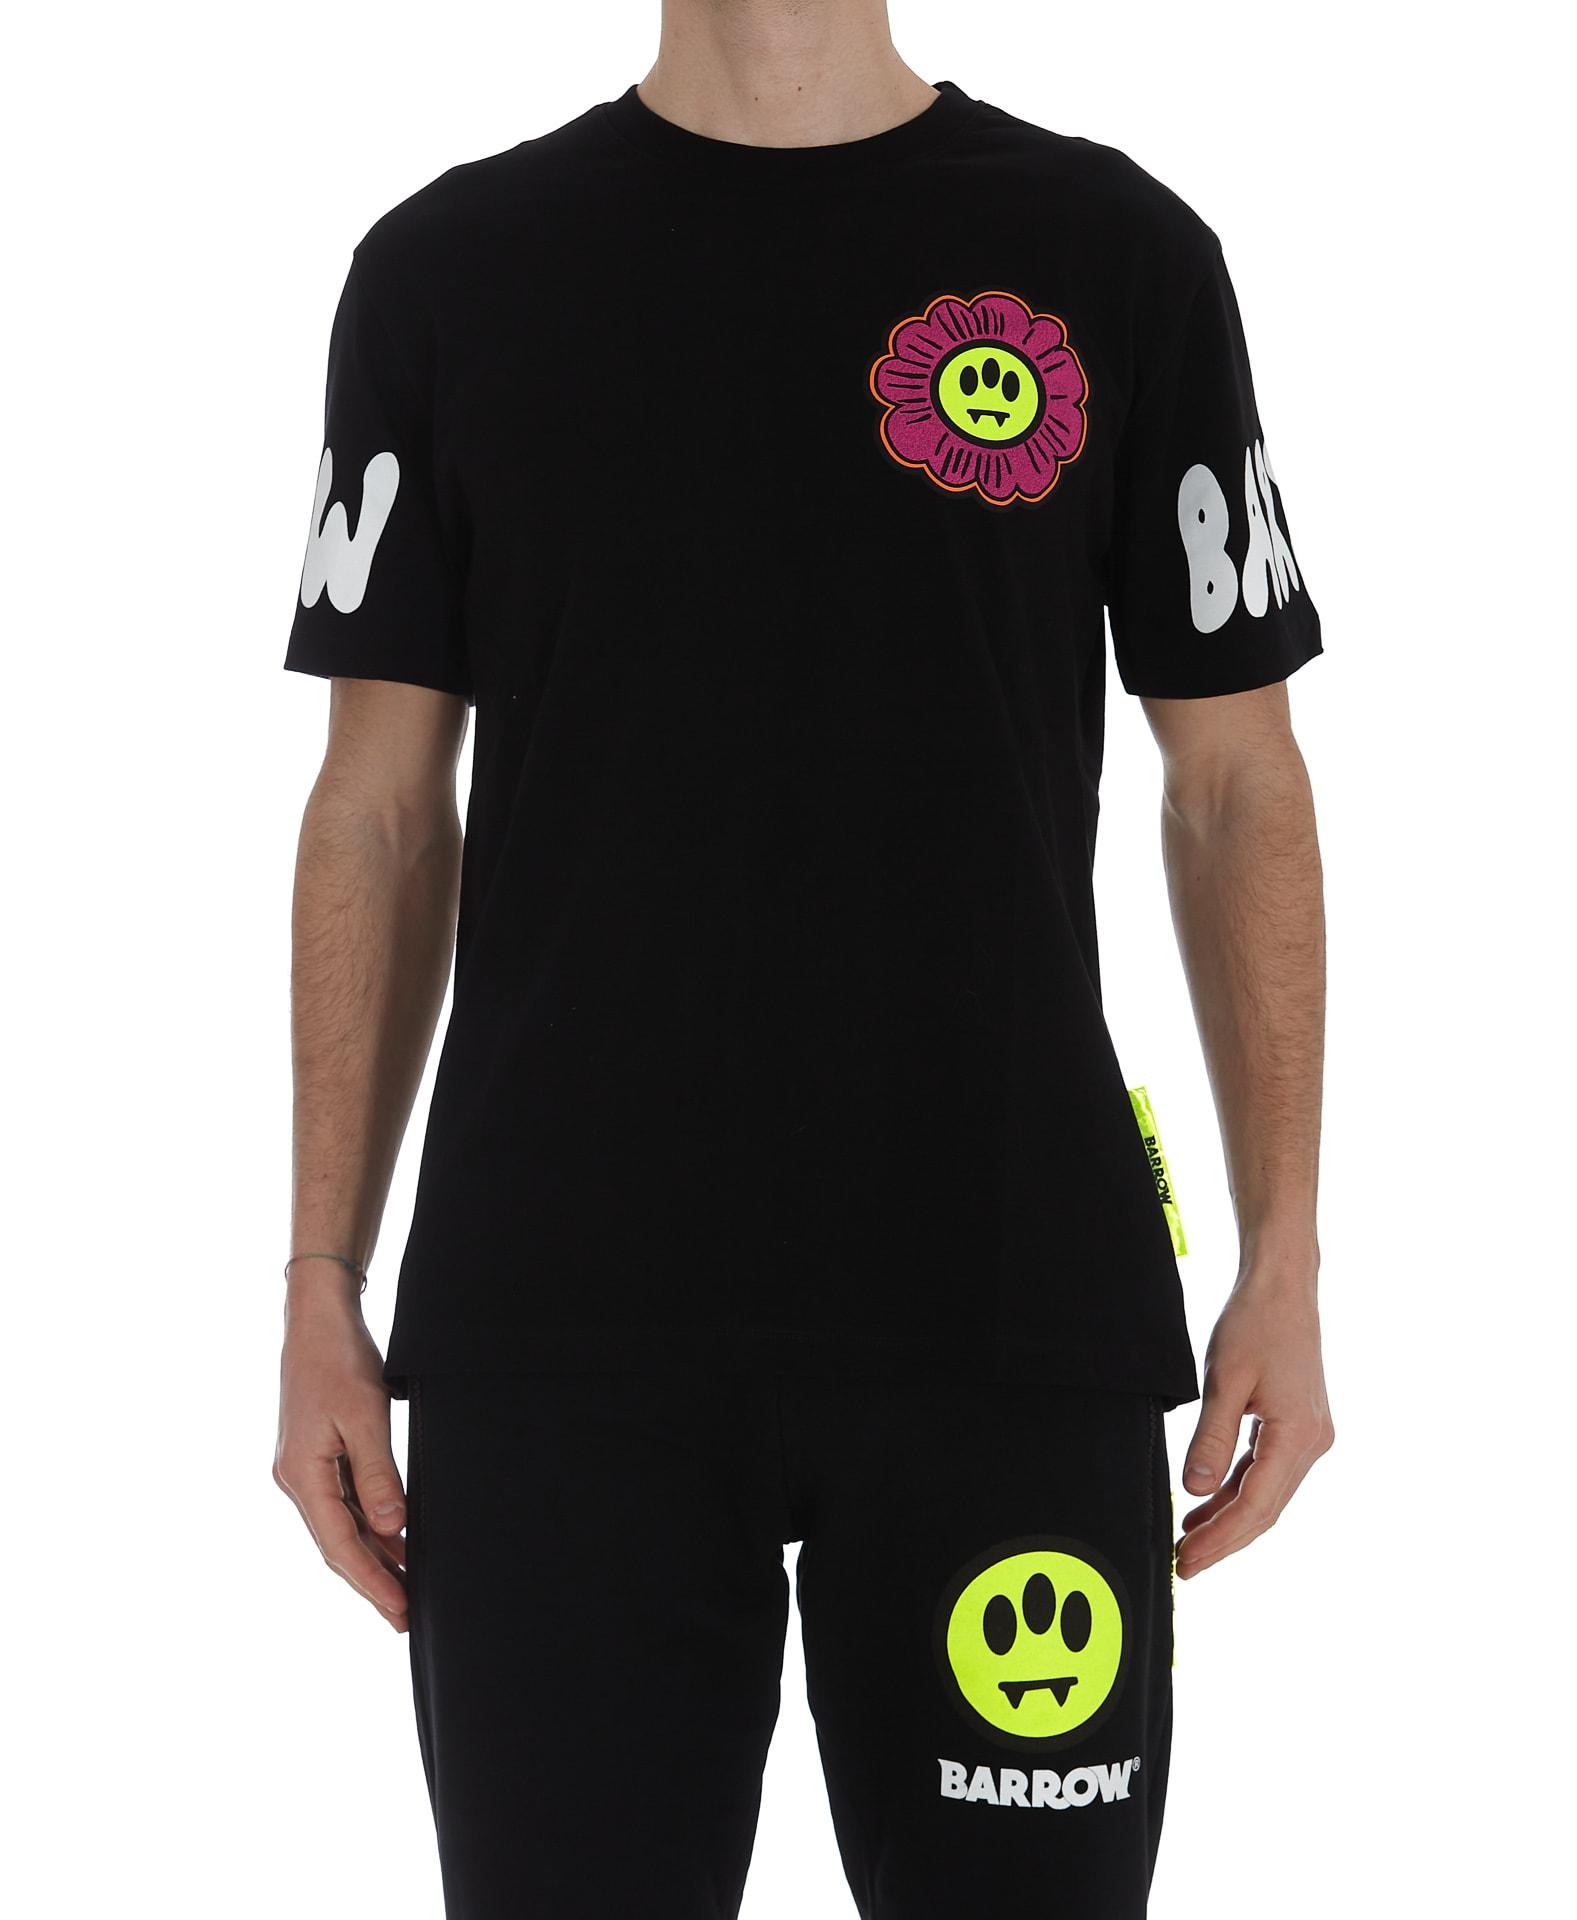 Barrow T-shirts LOGO T-SHIRT